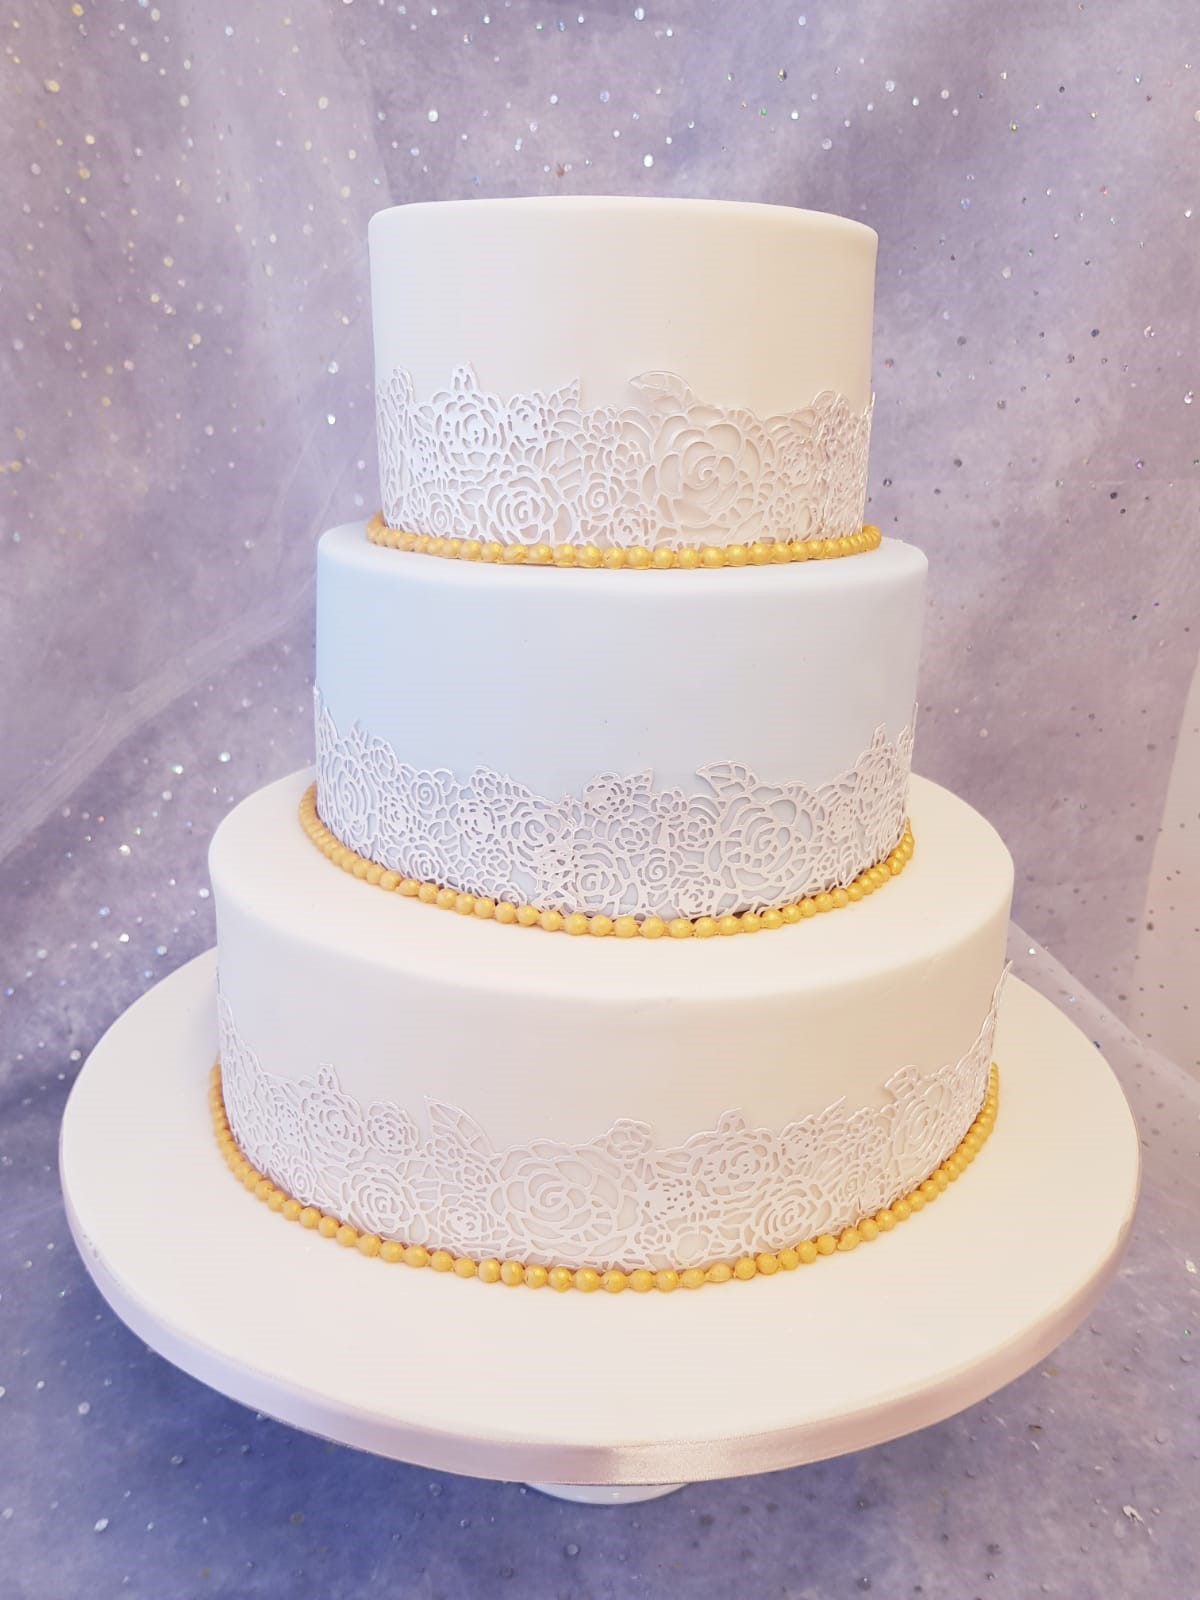 3 Tier Wedding Cake Lace Ravens Bakery Of Essex Ltd